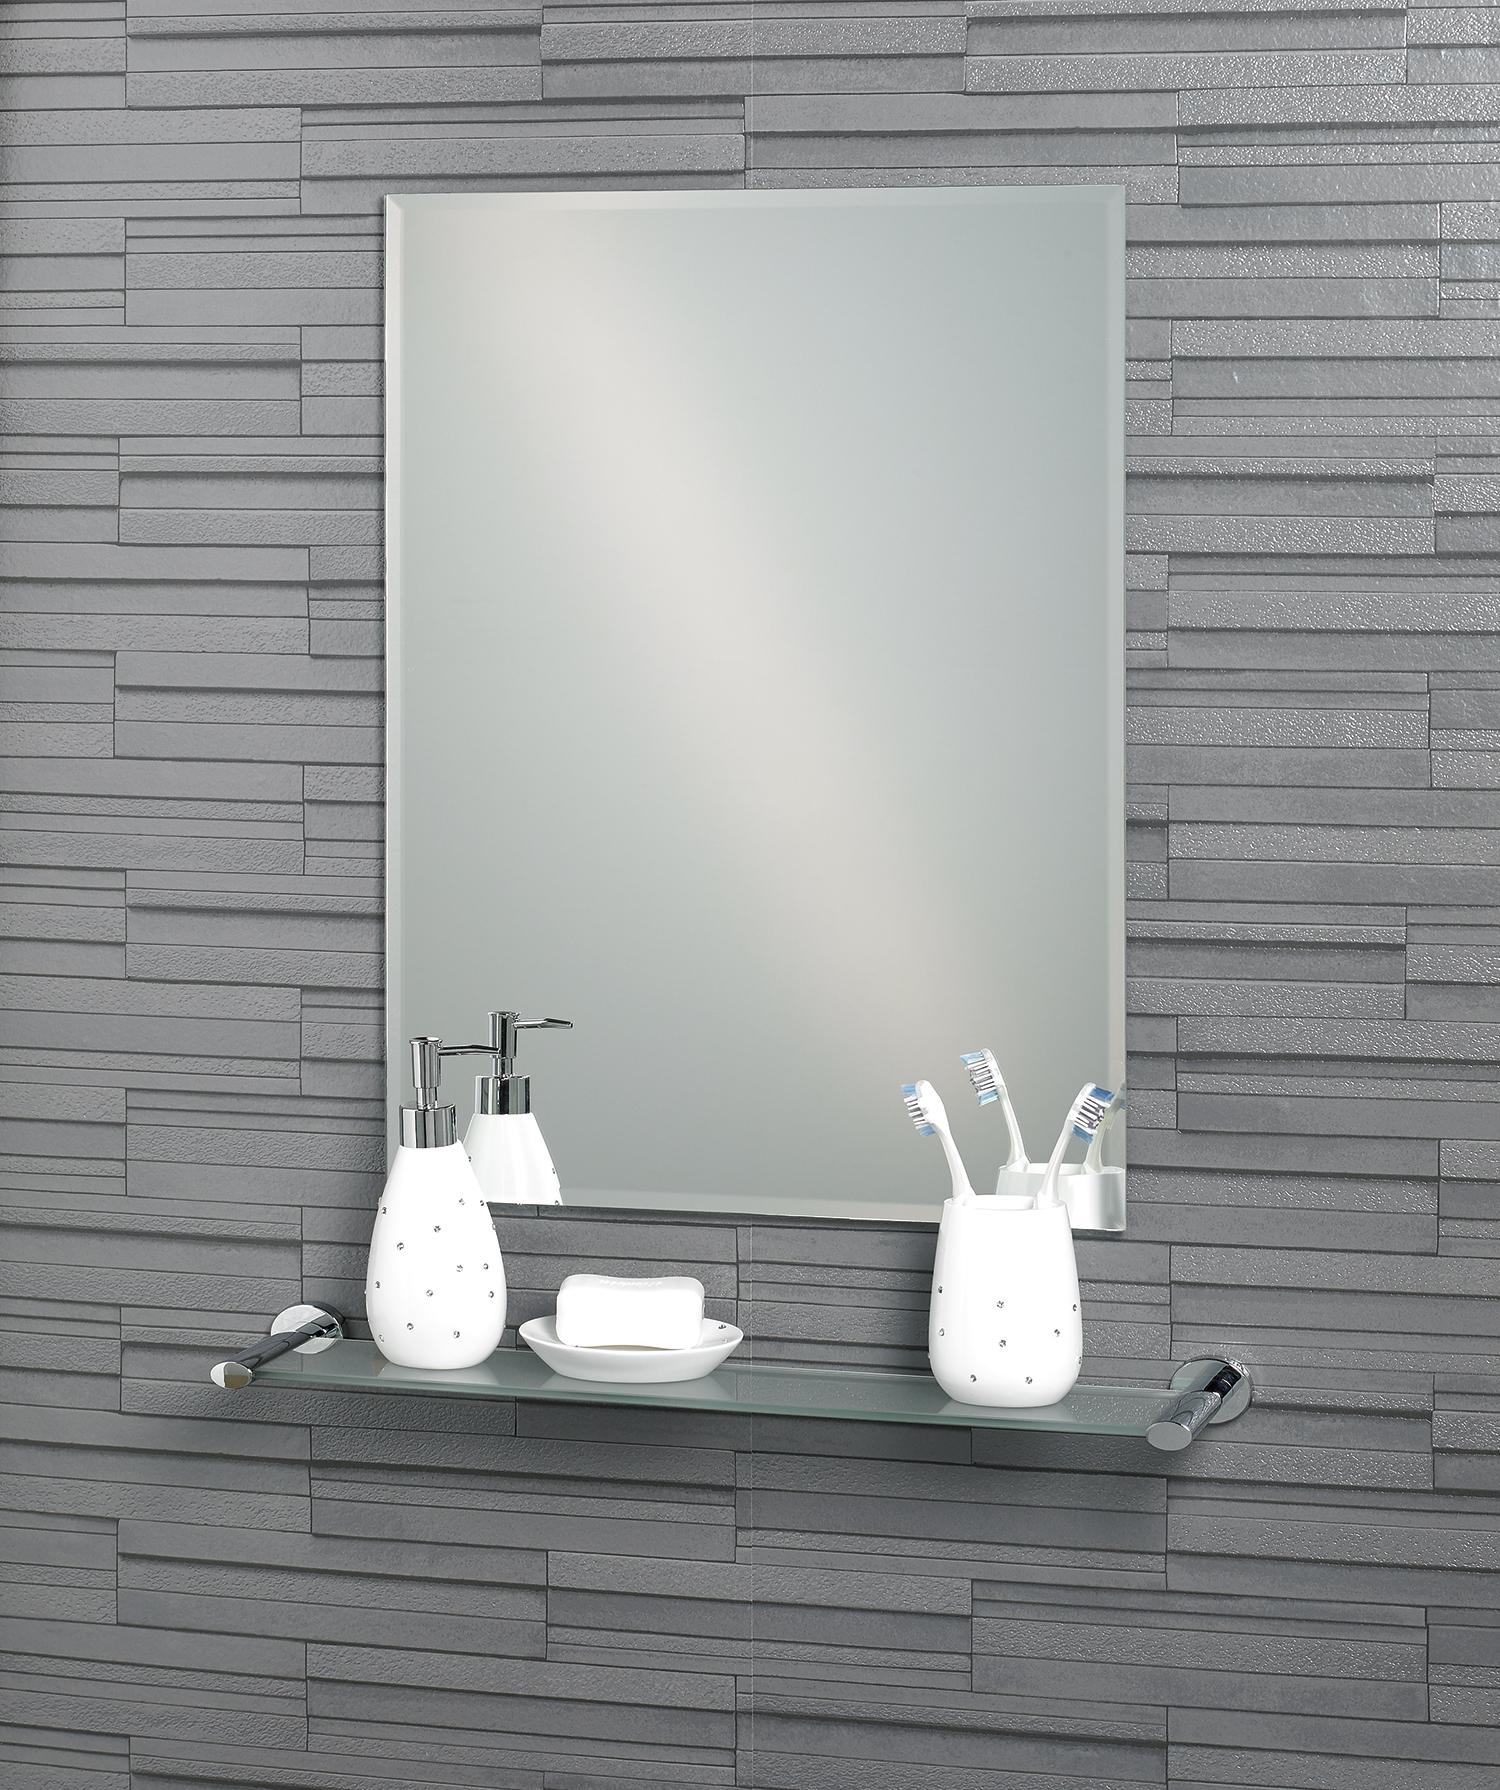 Buy Frameless Rectangular Bevelled Edge Small Fairmont Bathroom Mirror 1 Back2bath